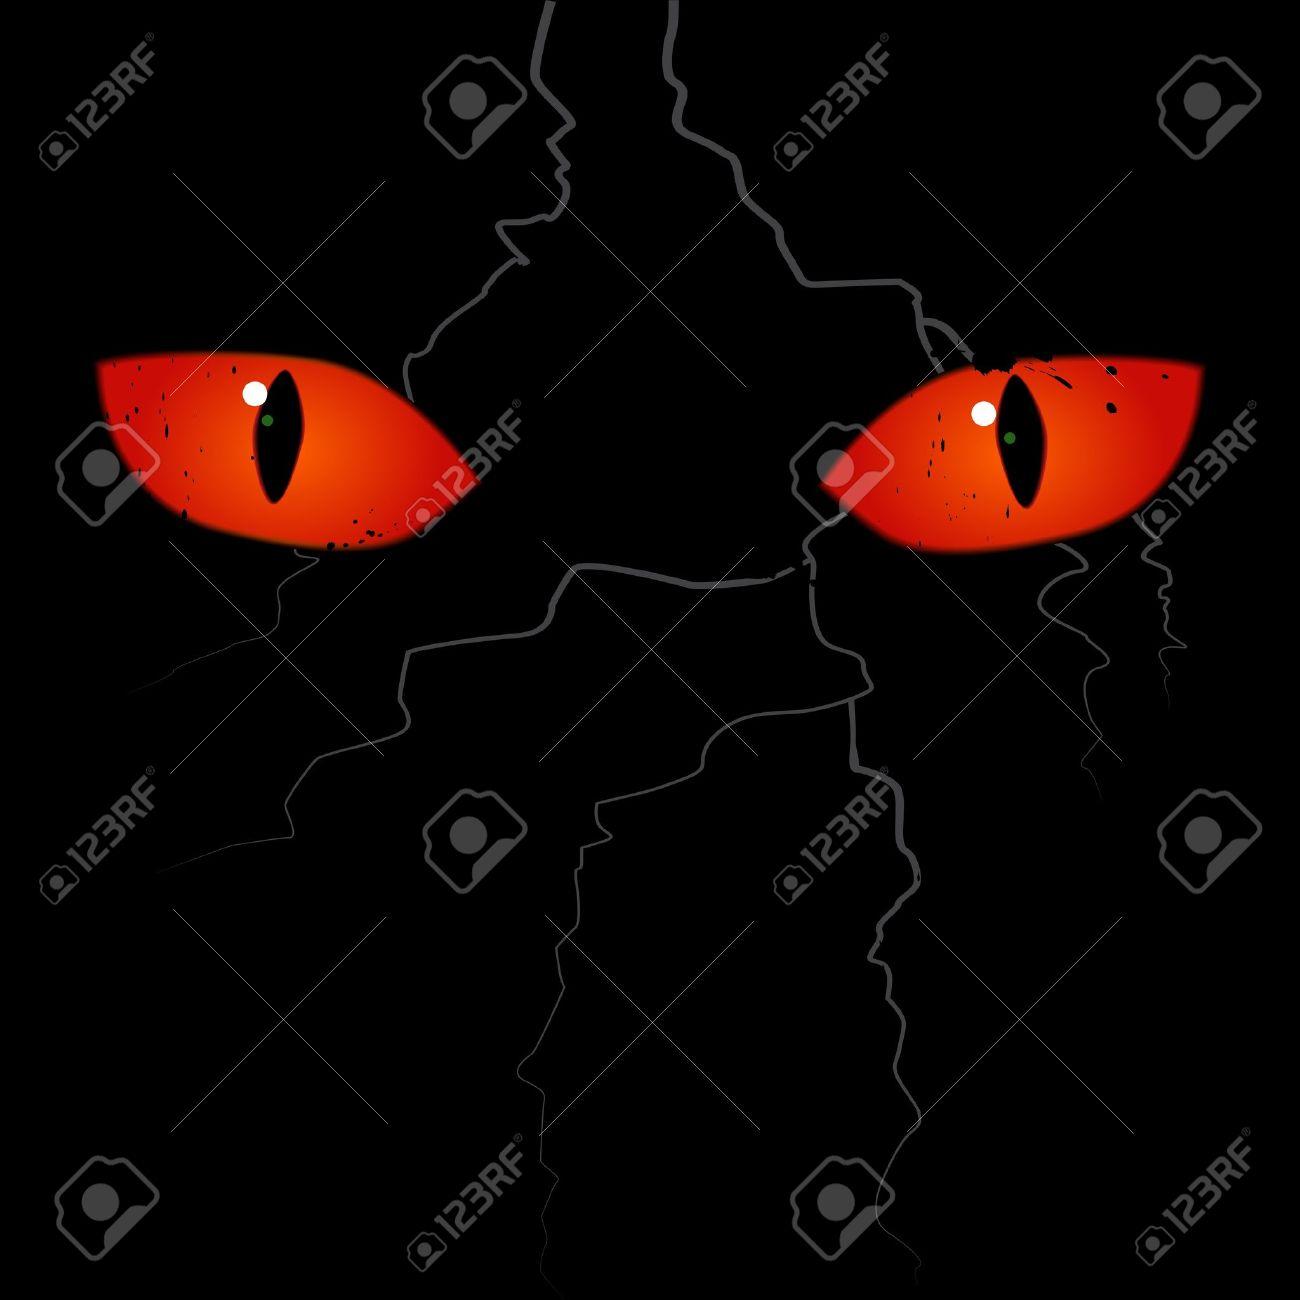 1,642 Scary Eyeball Stock Vector Illustration And Royalty Free.